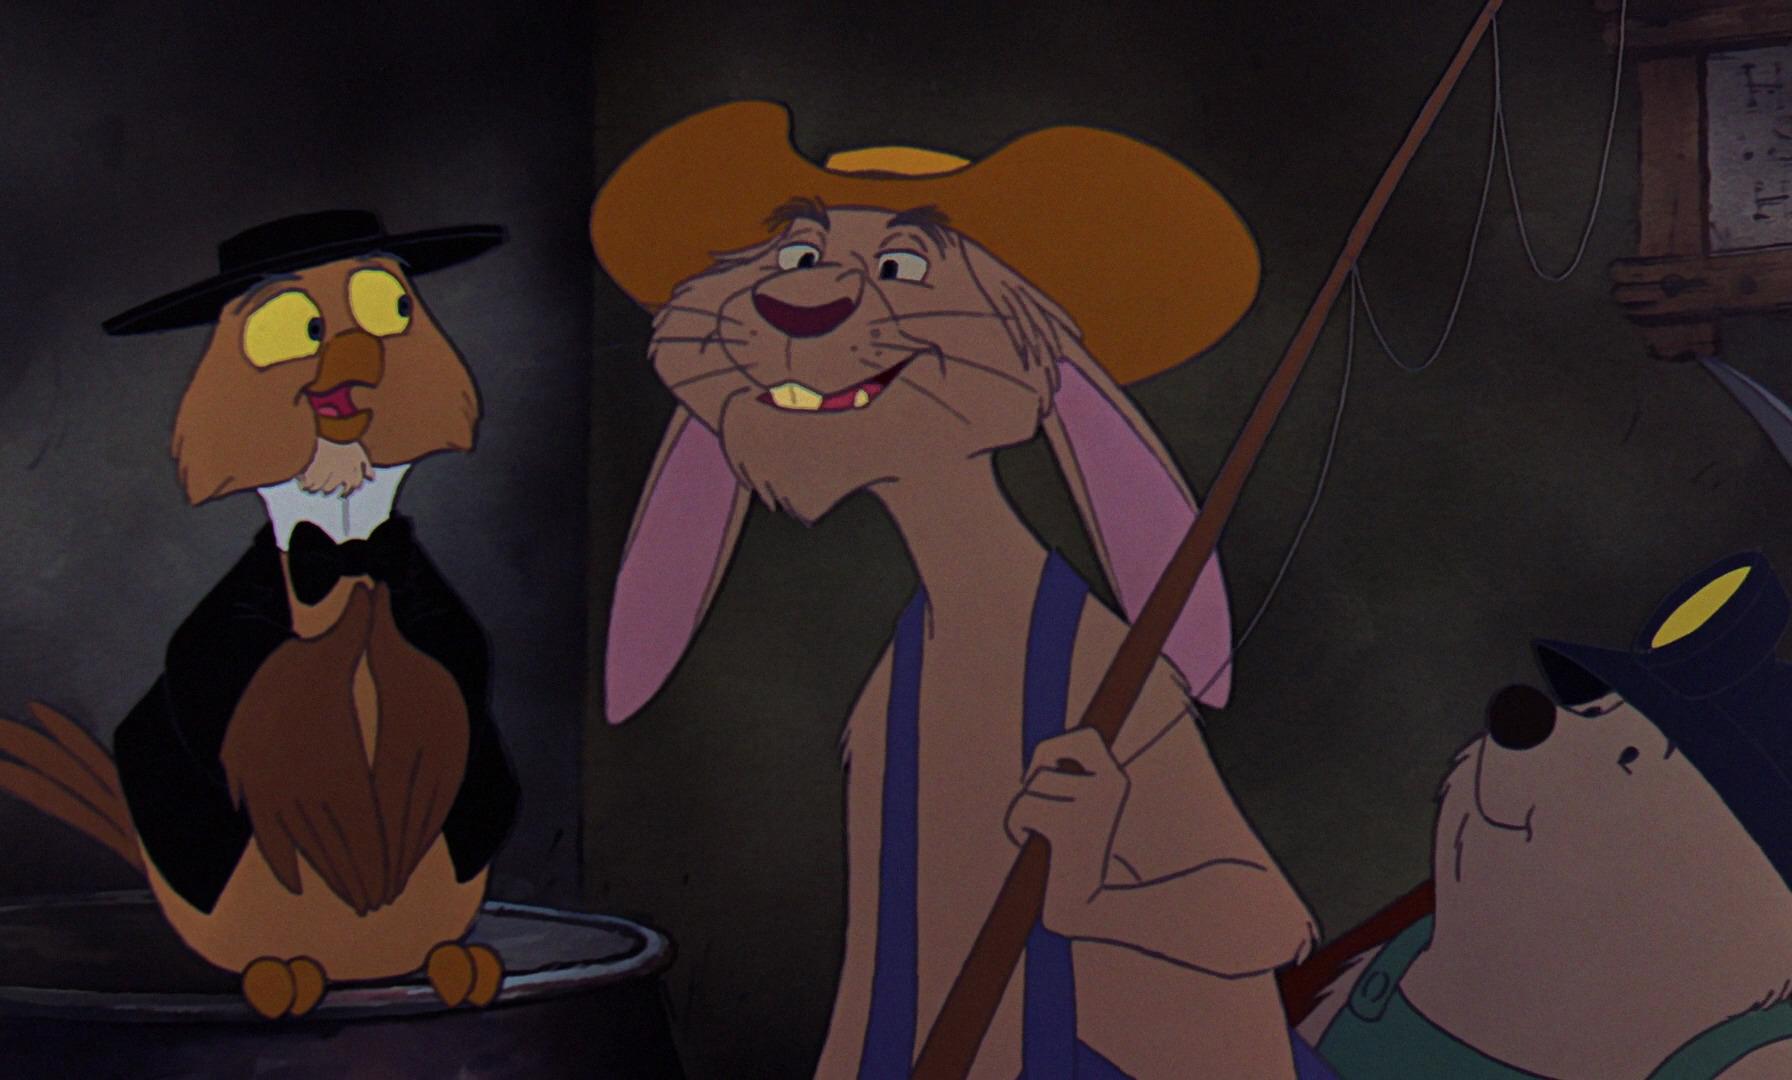 lapin rabbit personnage character disney aventures bernard bianca rescuers